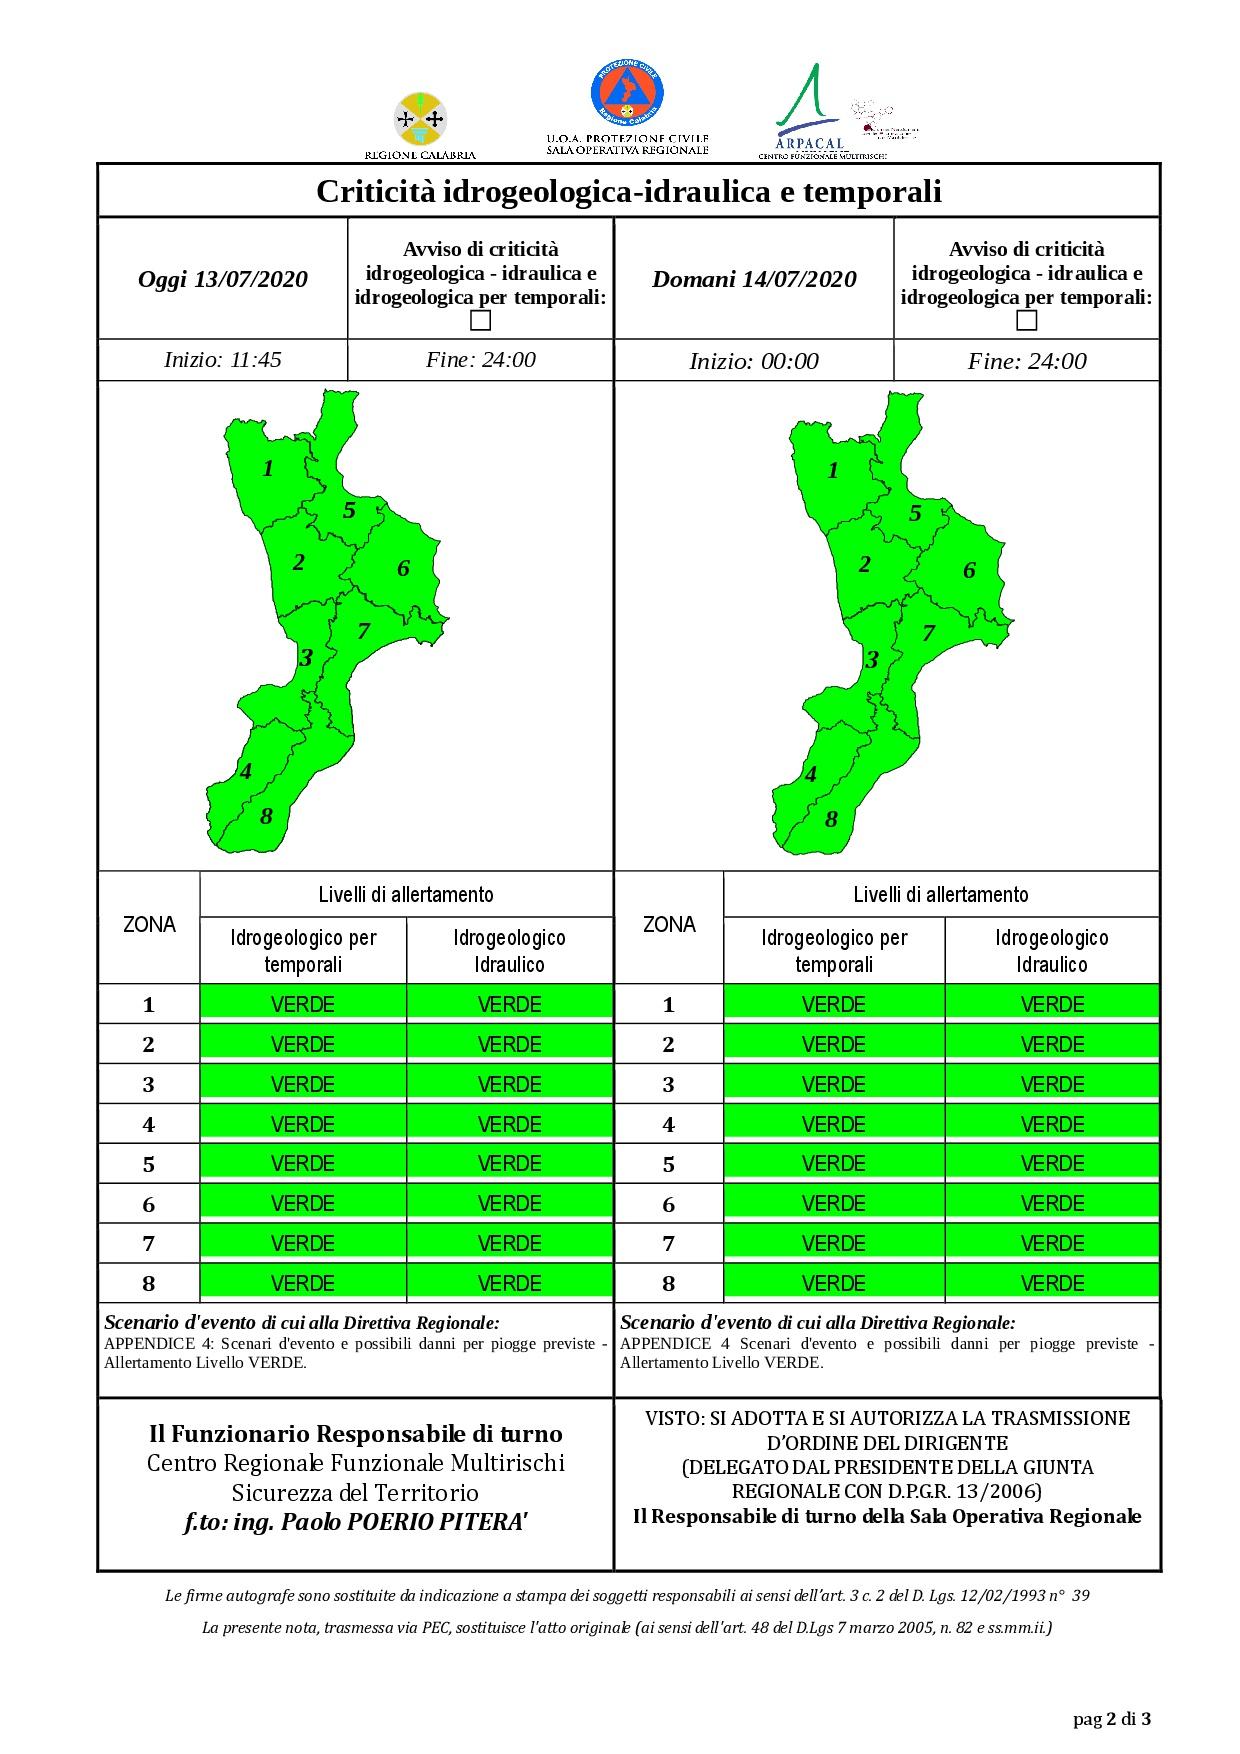 Criticità idrogeologica-idraulica e temporali in Calabria 13-07-2020